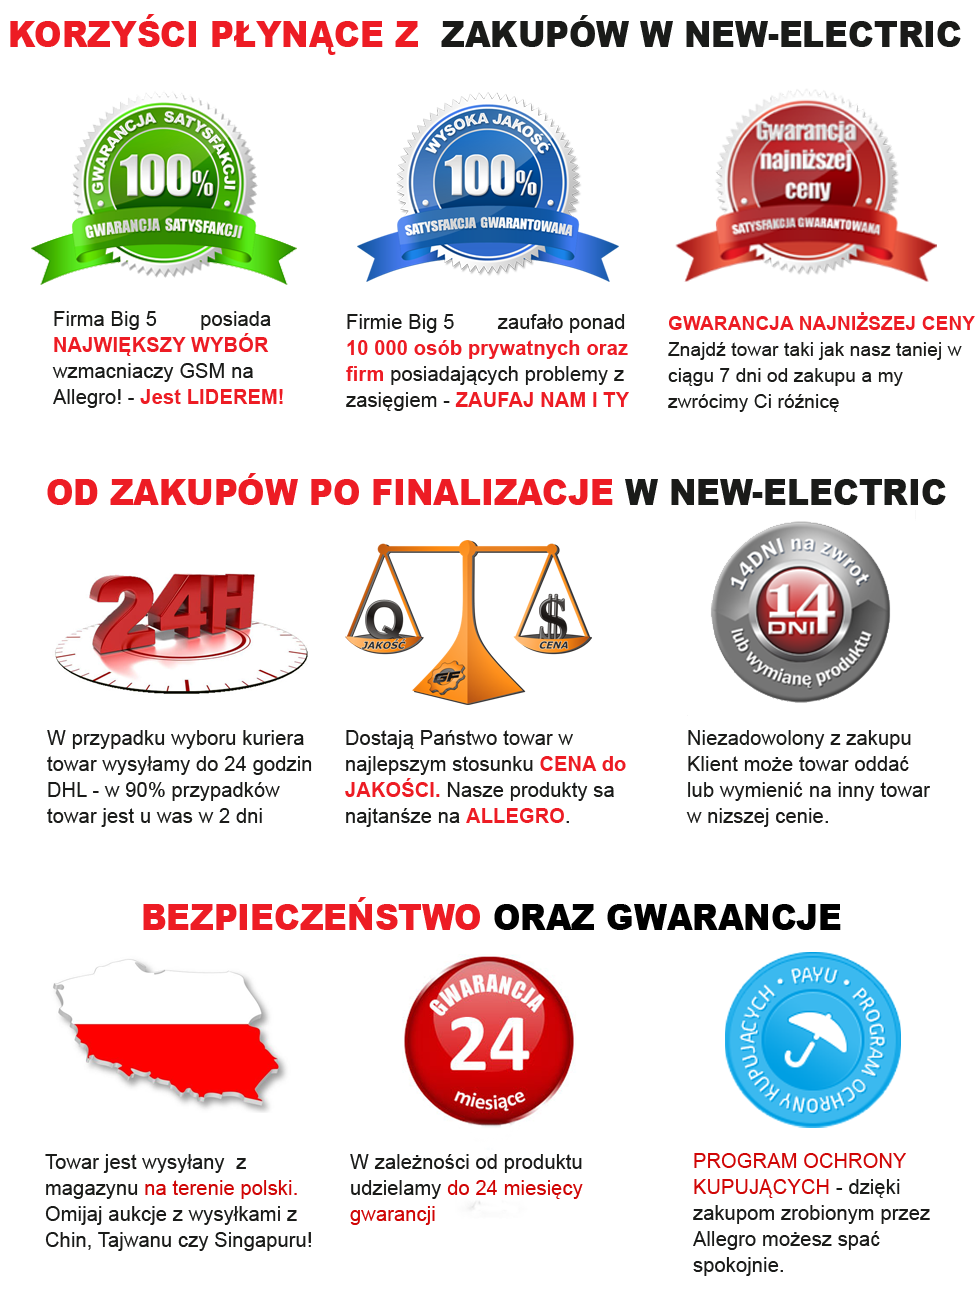 korzysci-dolne-2015.png